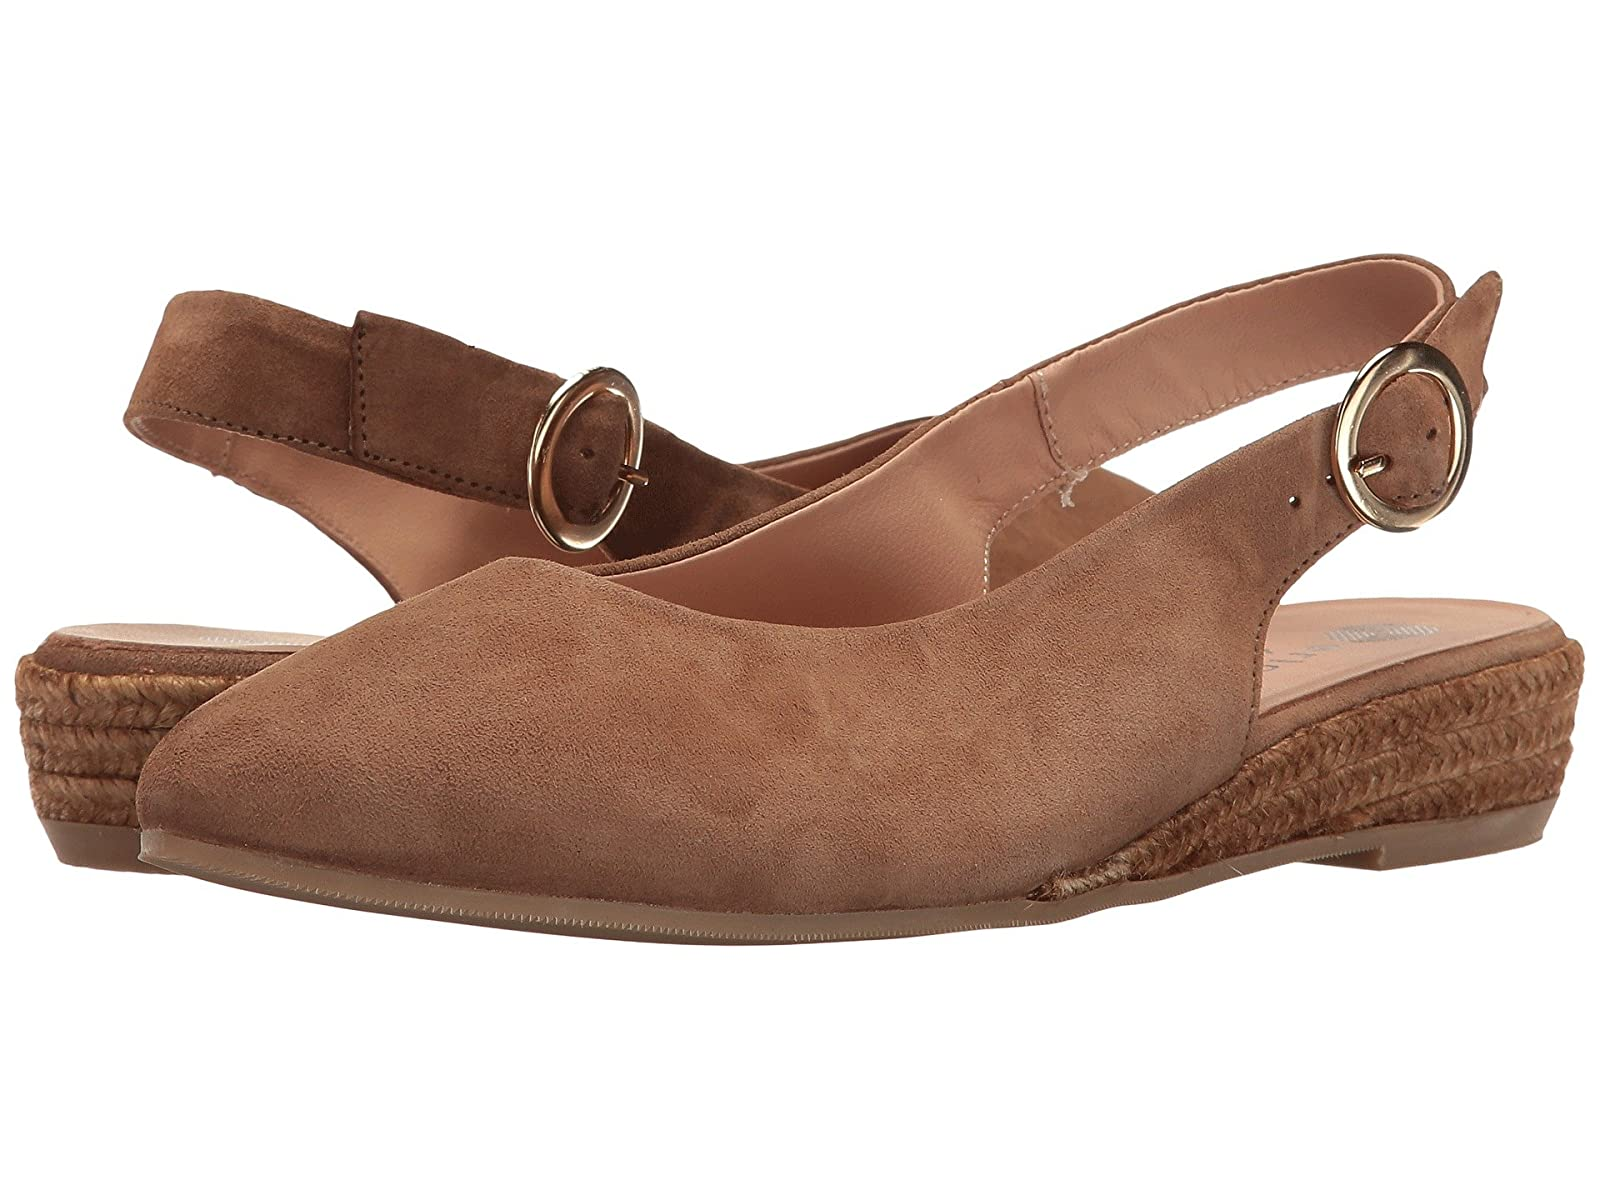 Eric Michael ChloeAtmospheric grades have affordable shoes